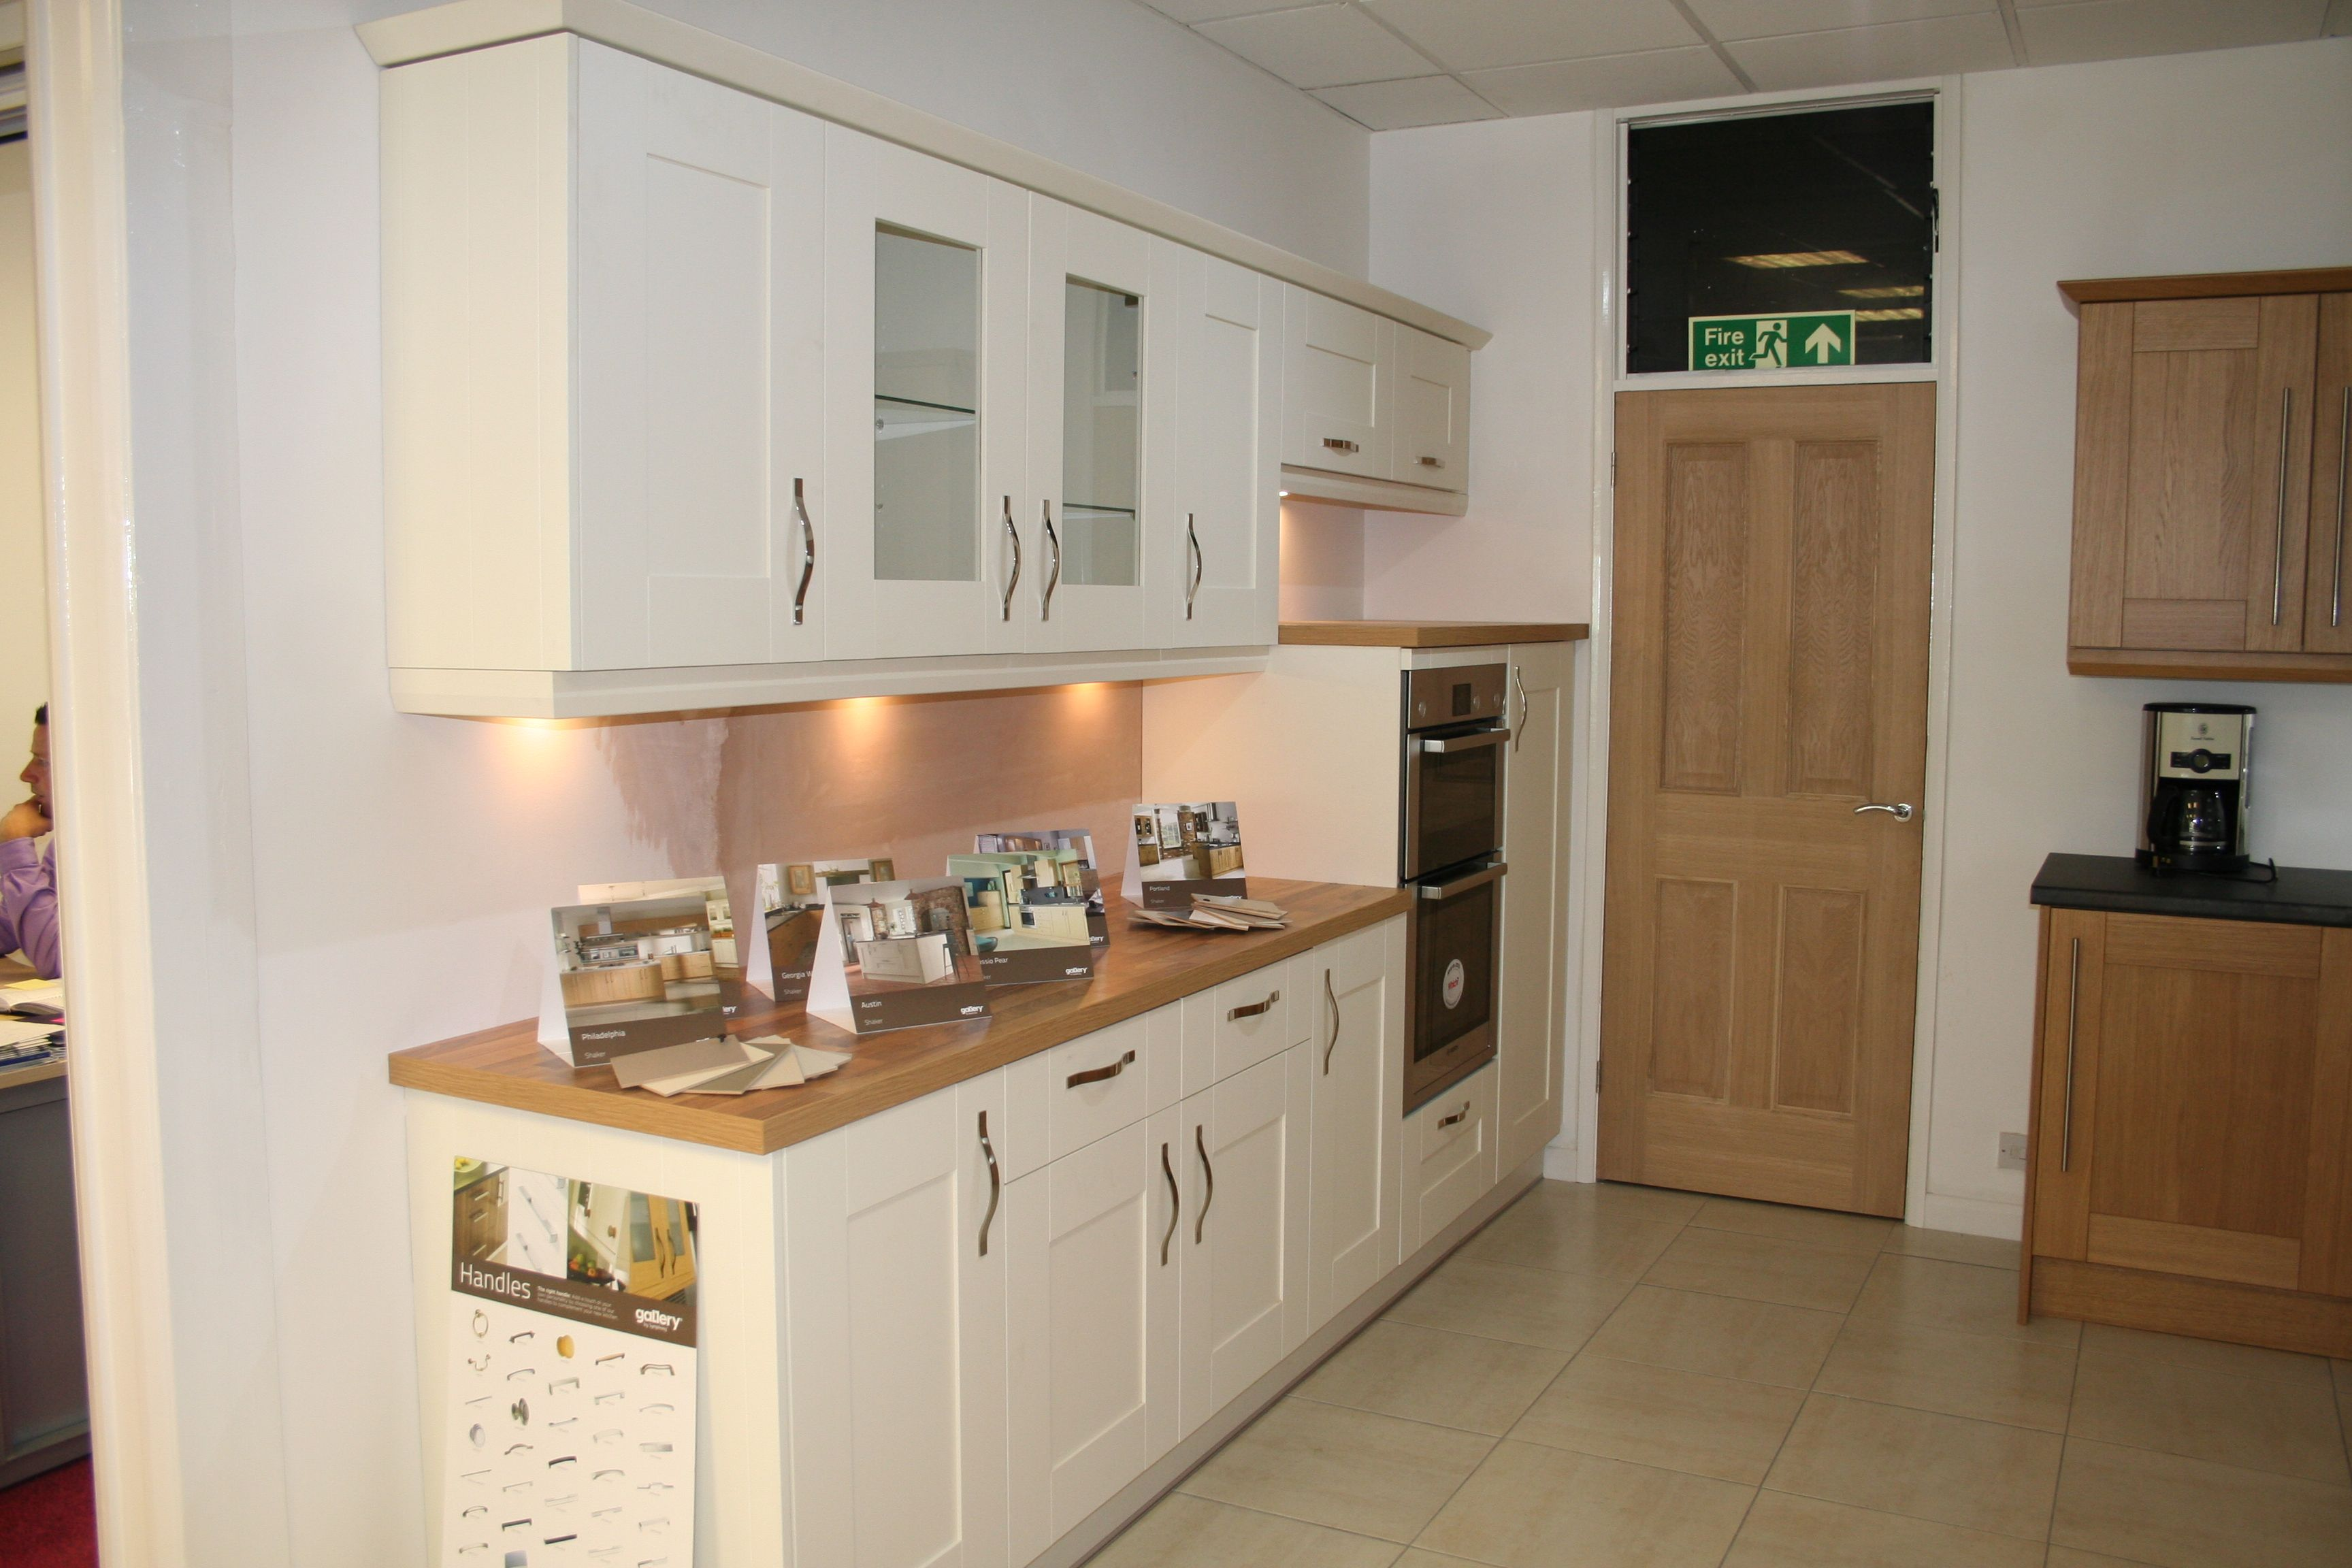 Kitchens Basingstoke Showrooom Providing Double Glazing Windows, Conservatories, Upvc Doors,